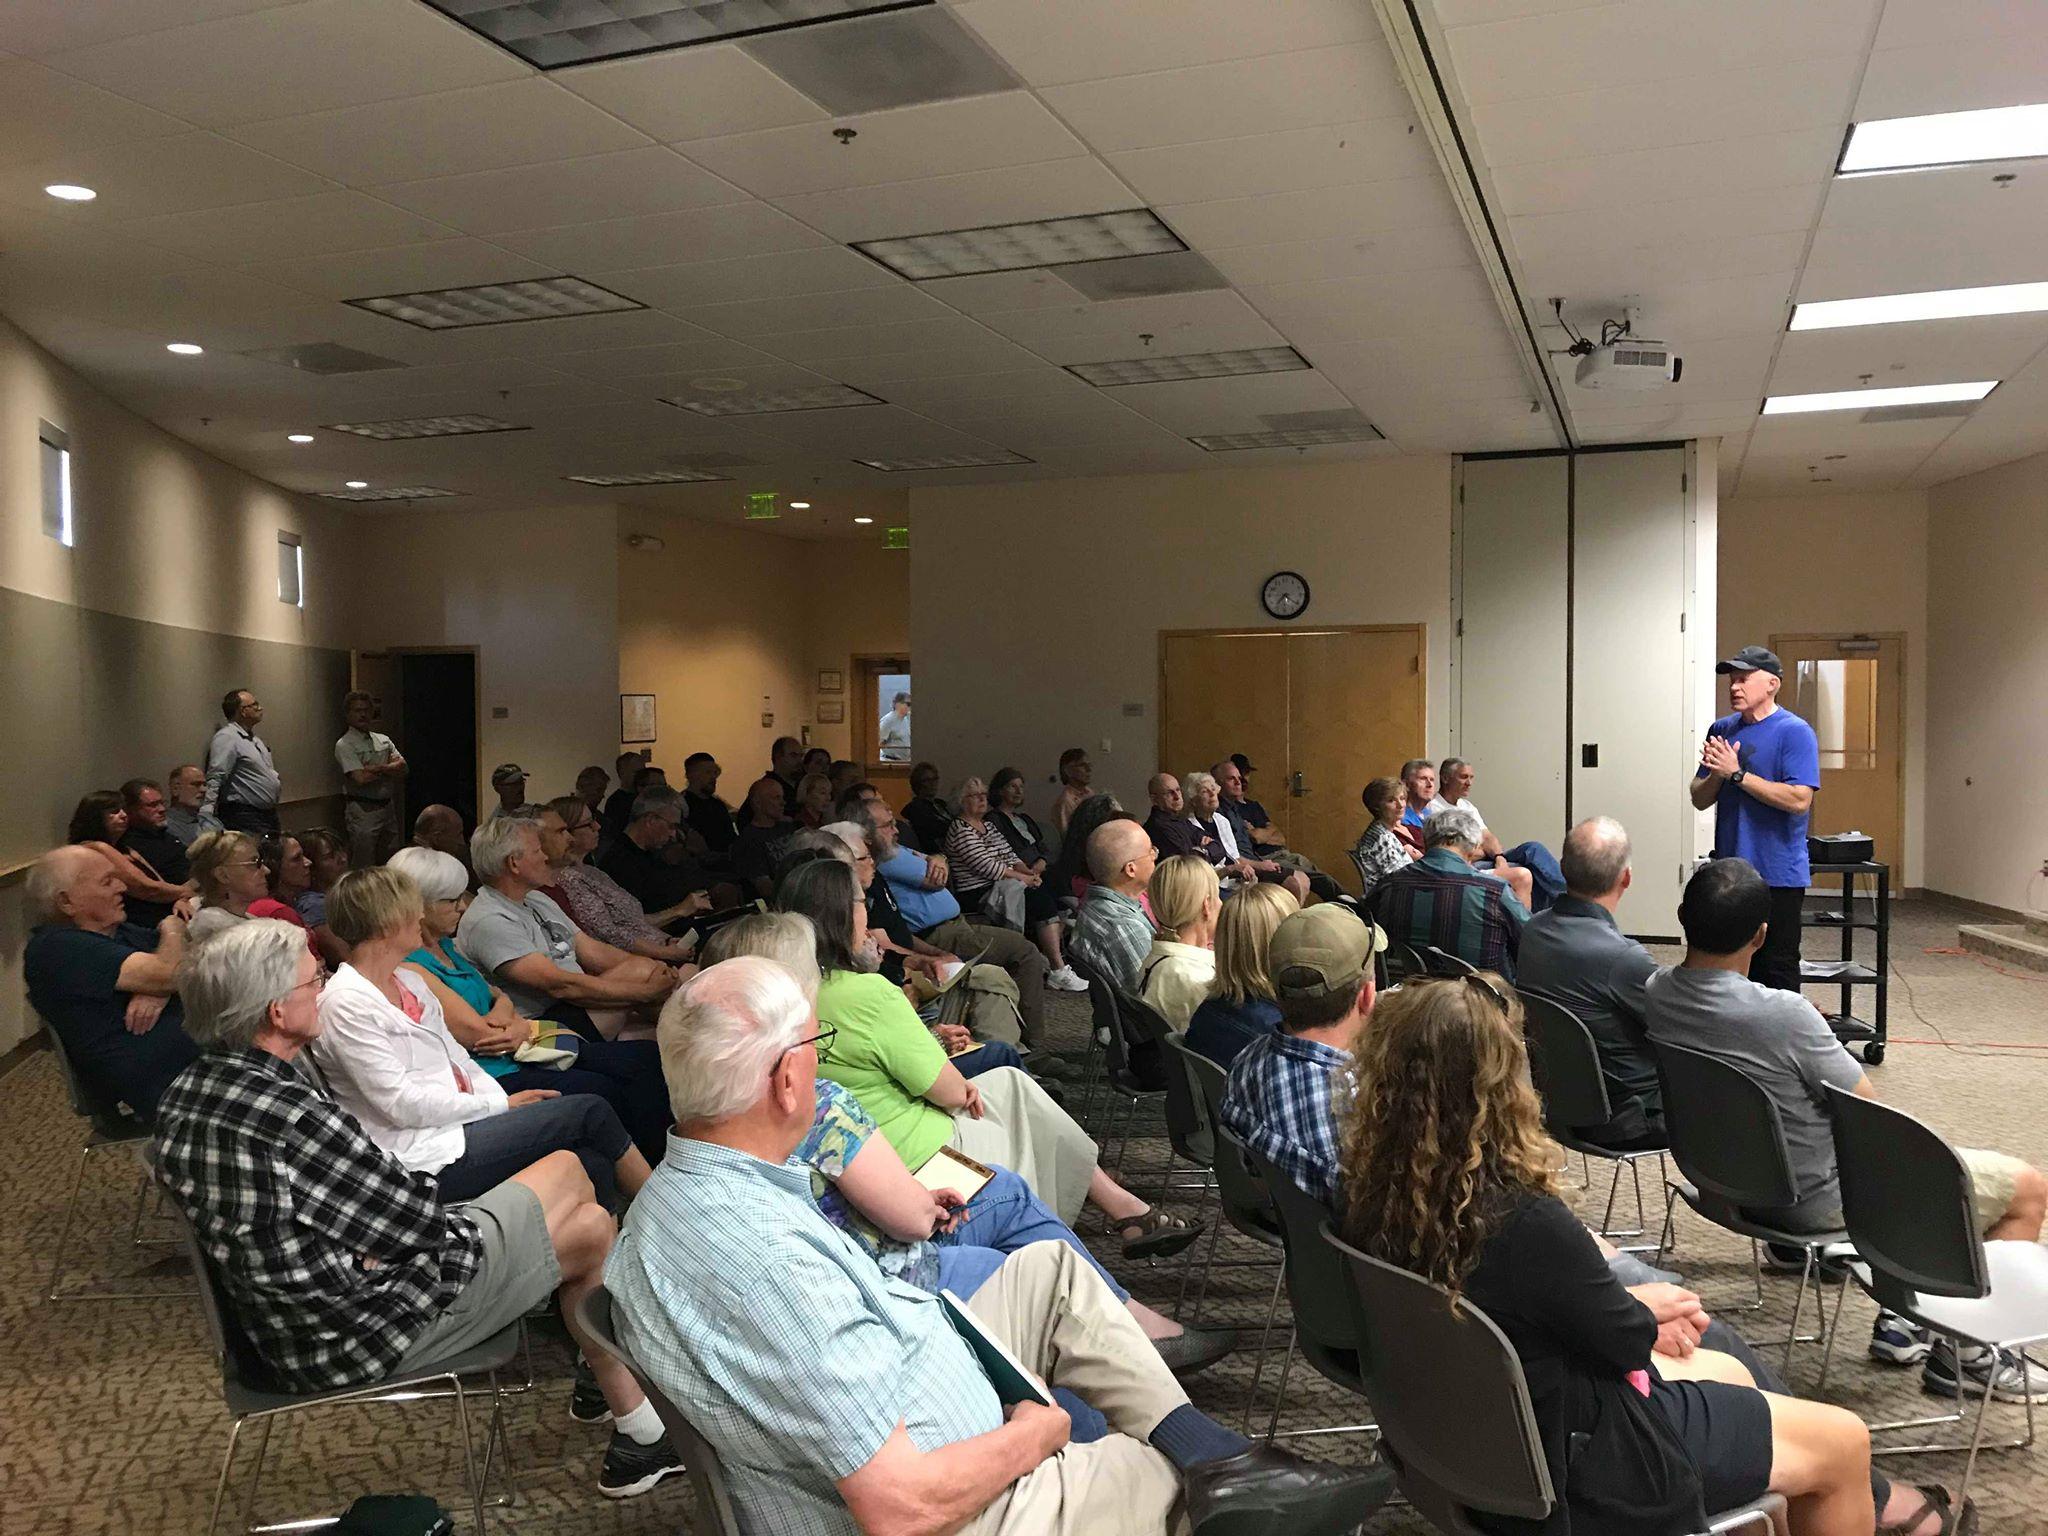 Speaking to a group at Kennewick, Washington